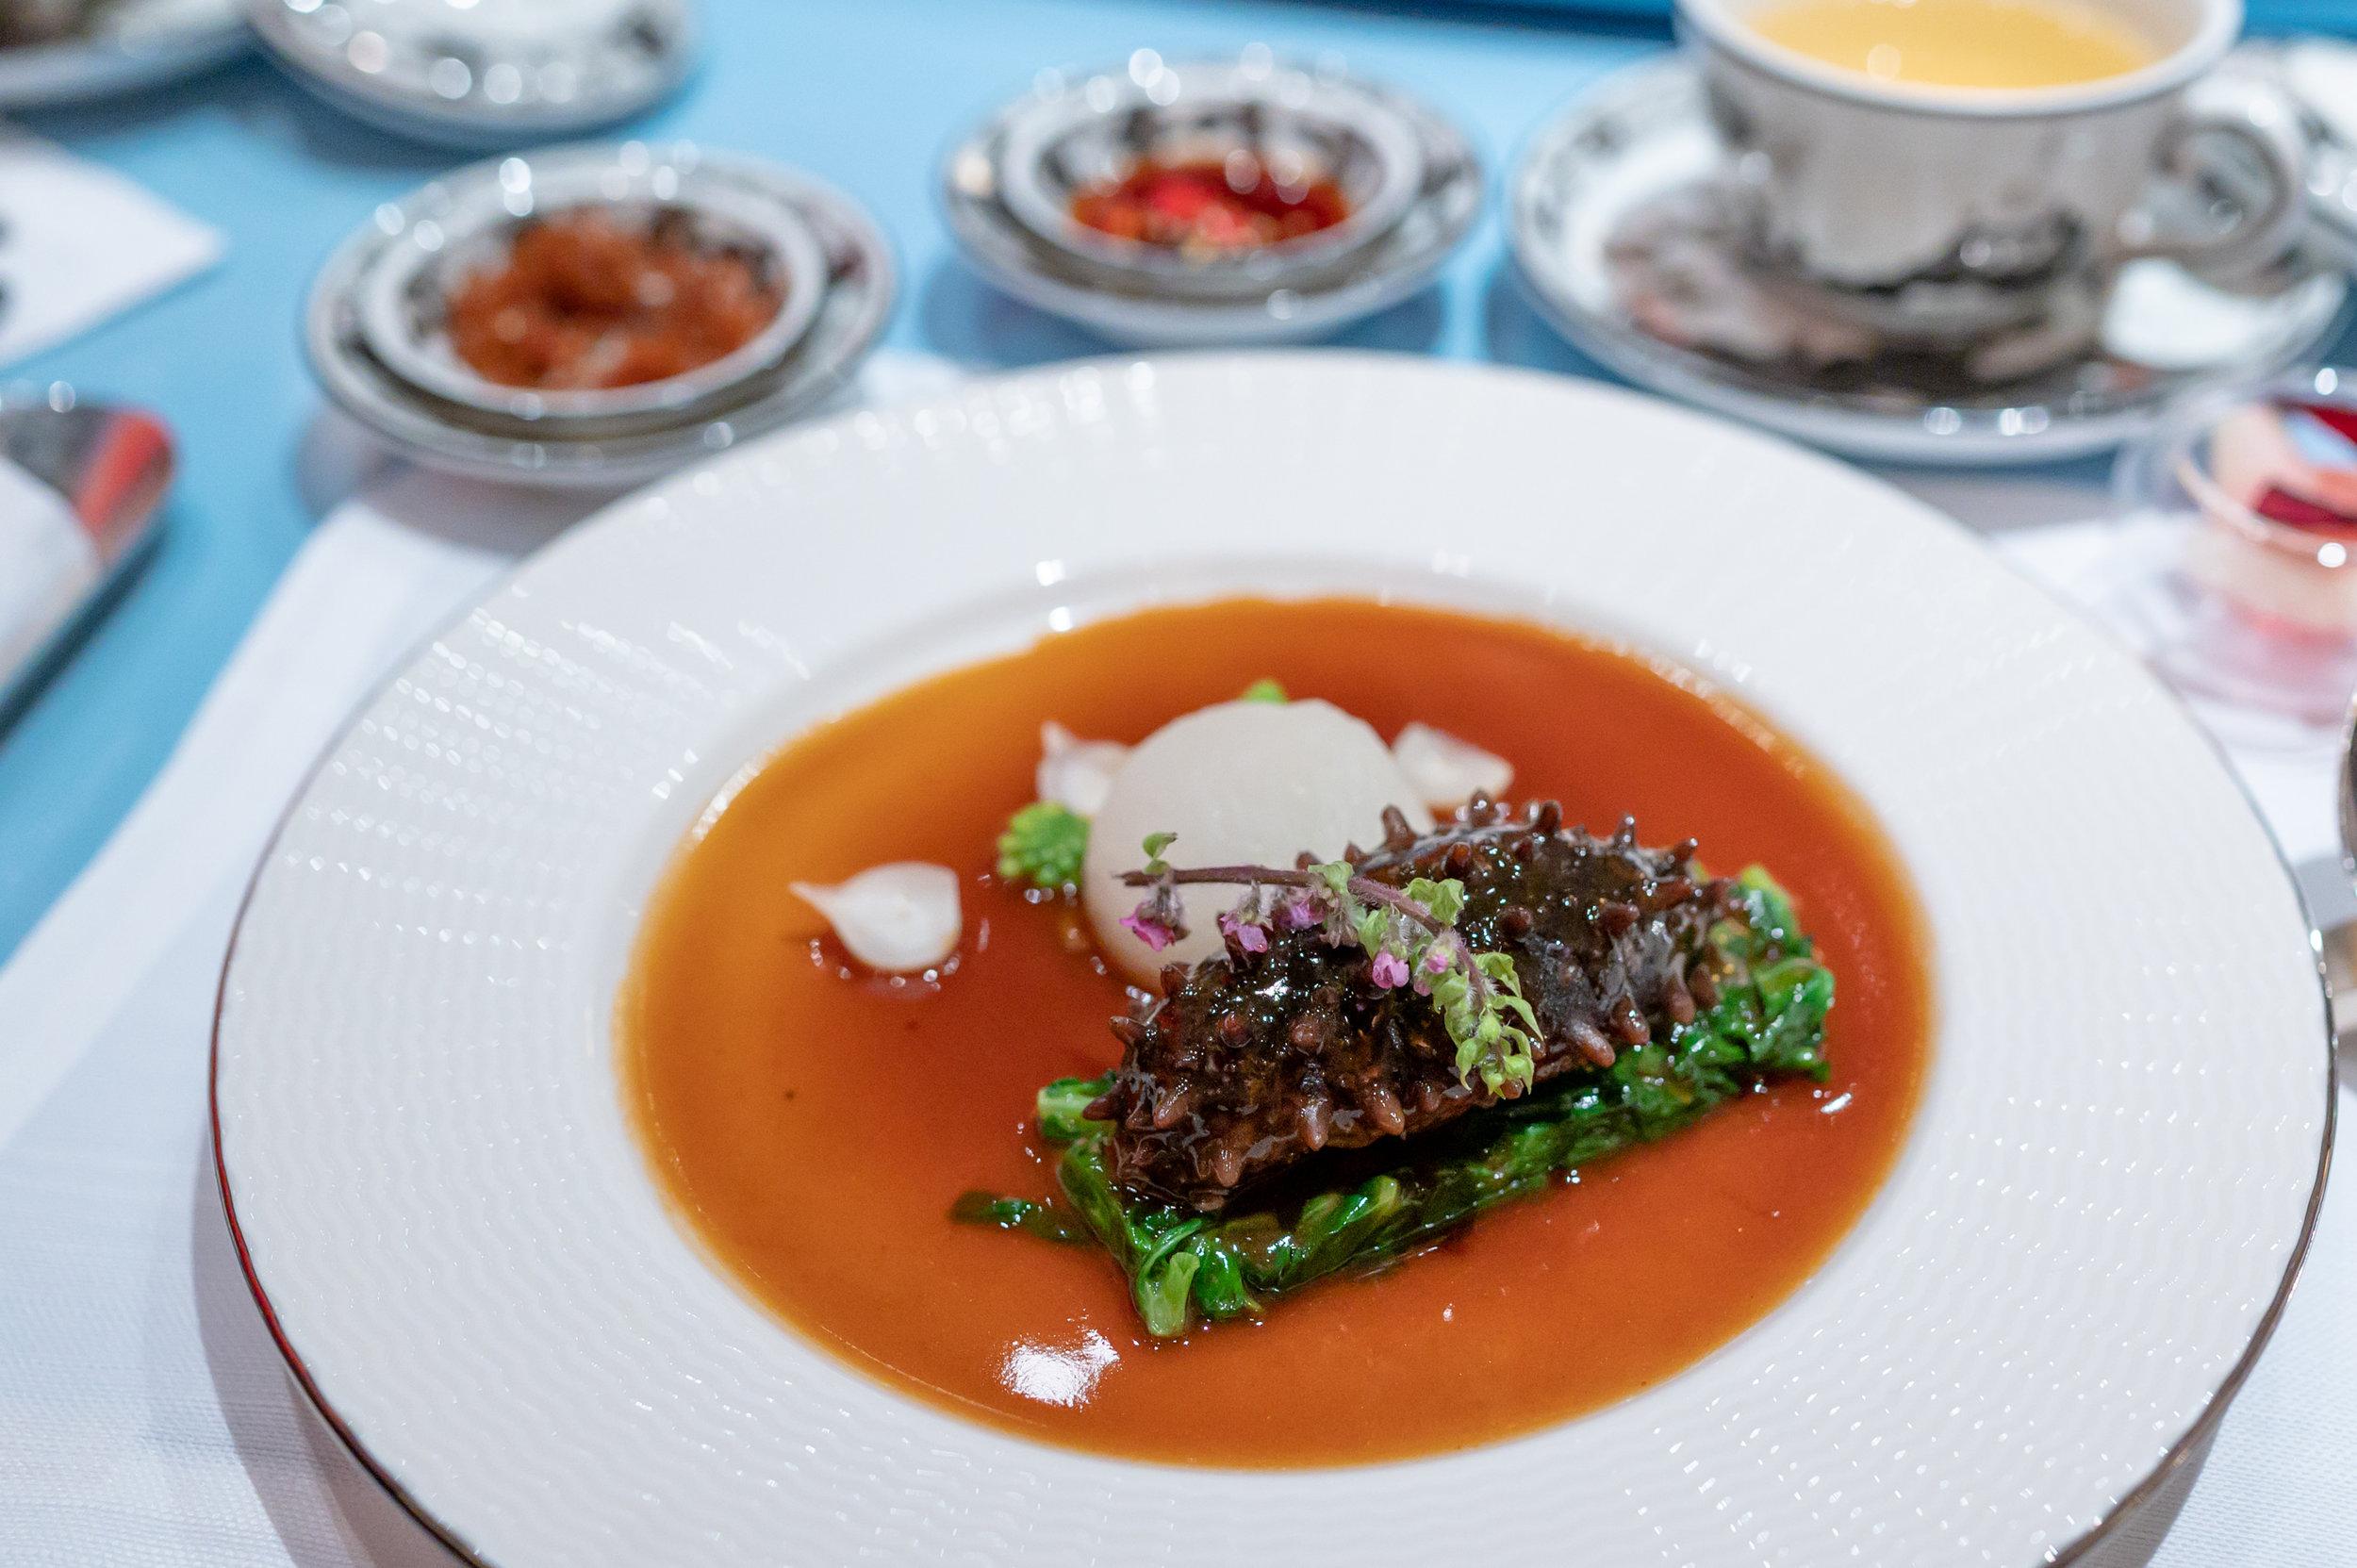 Braised Stuffed Prickly Sea Cucumber, Iberico Pork, Preserved Vegetable, Winter Melon, Mushroom, Seasonal Vegetable  Summer Pavilion - The Ritz-Carlton, Millenia Singapore